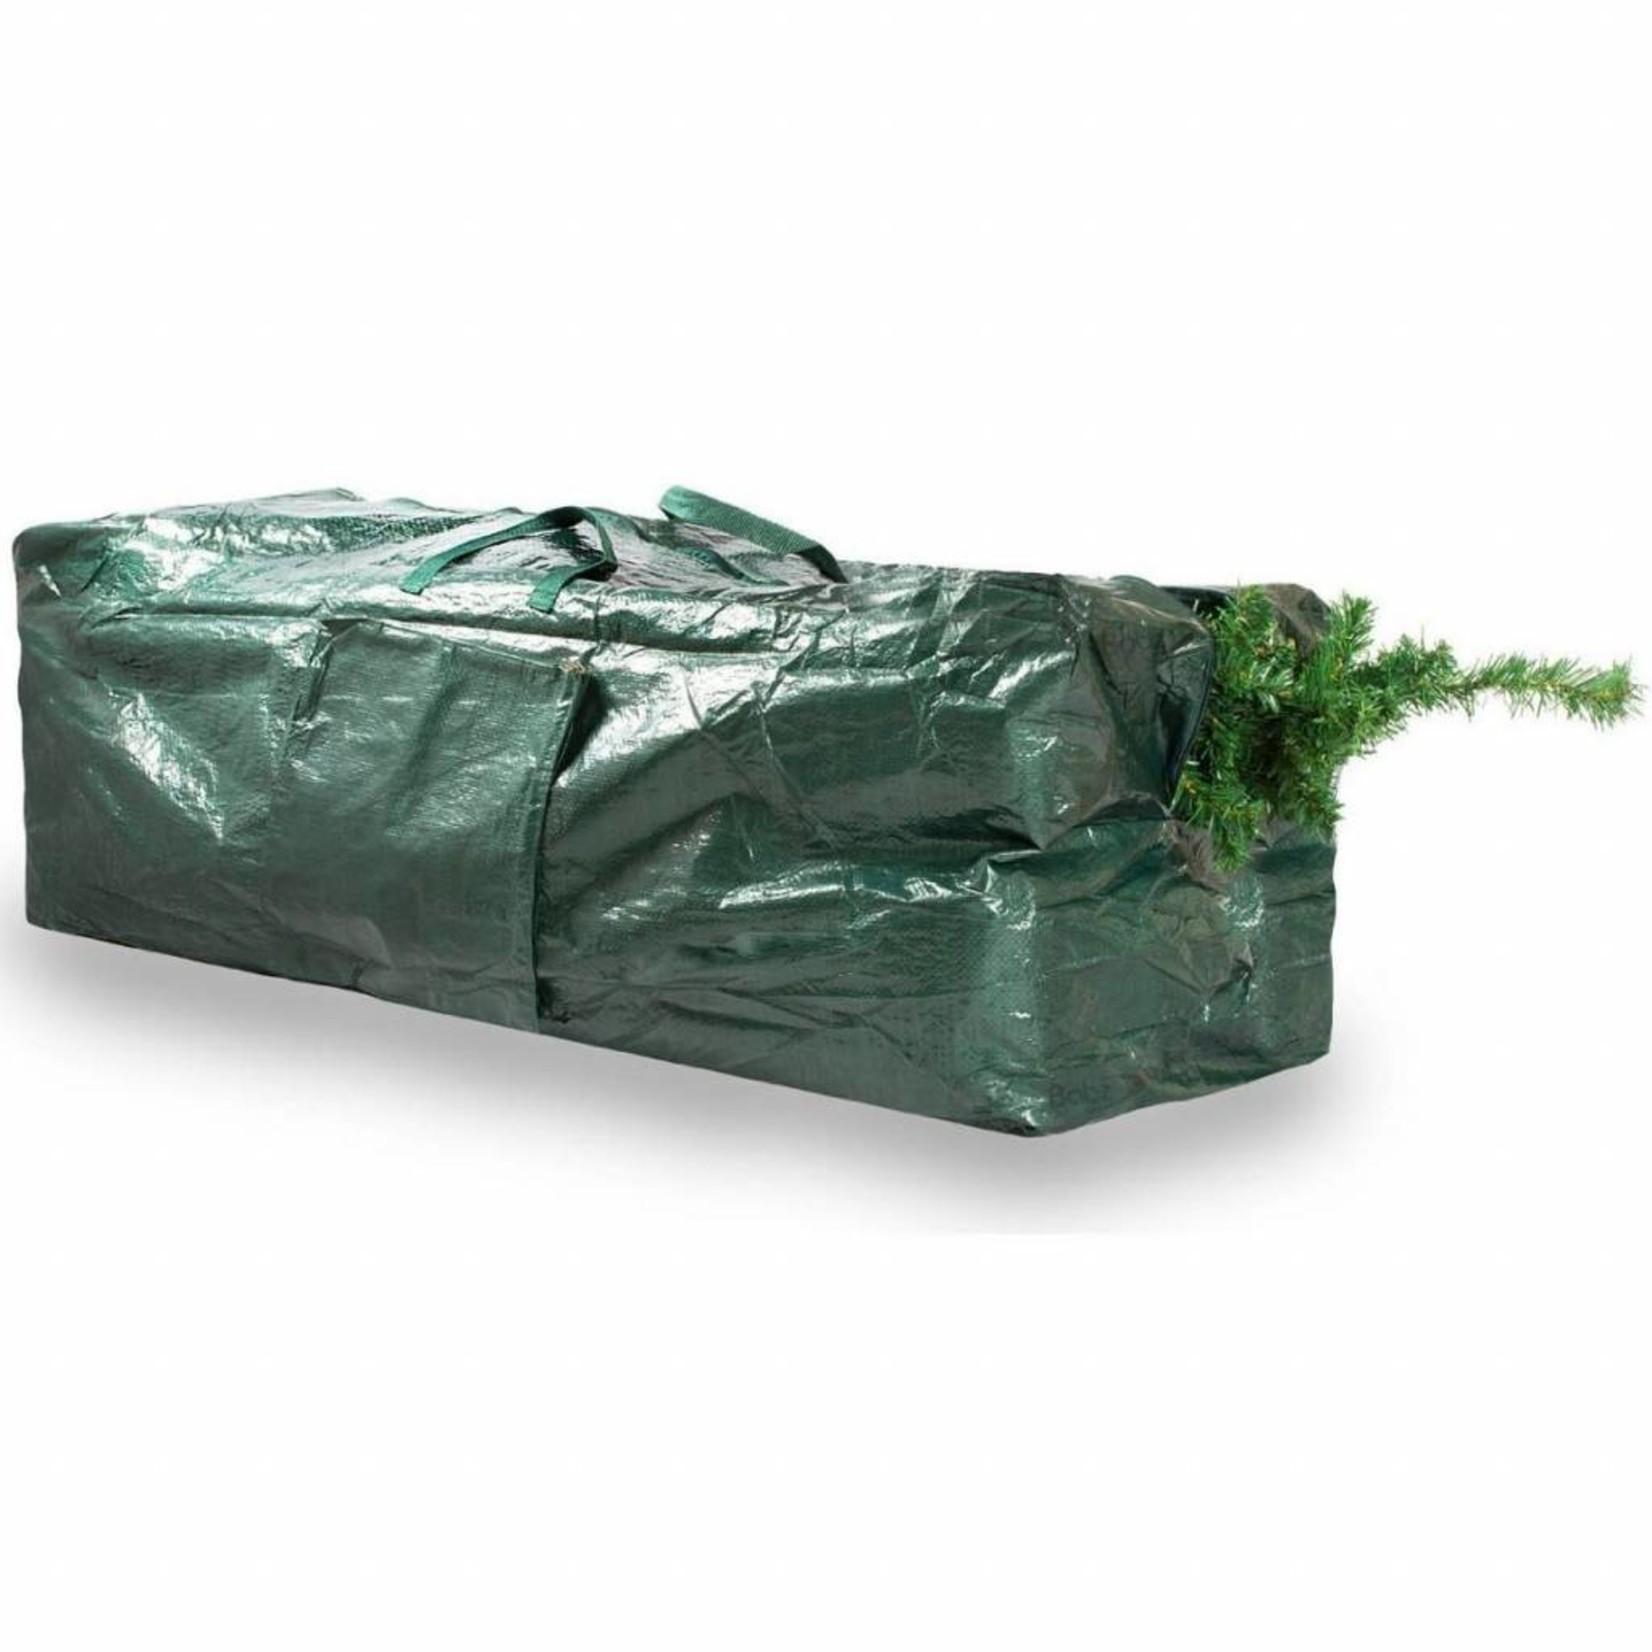 S&G CHRISTMAS TREE STORAGE BAG 120 * 33 * 48cm